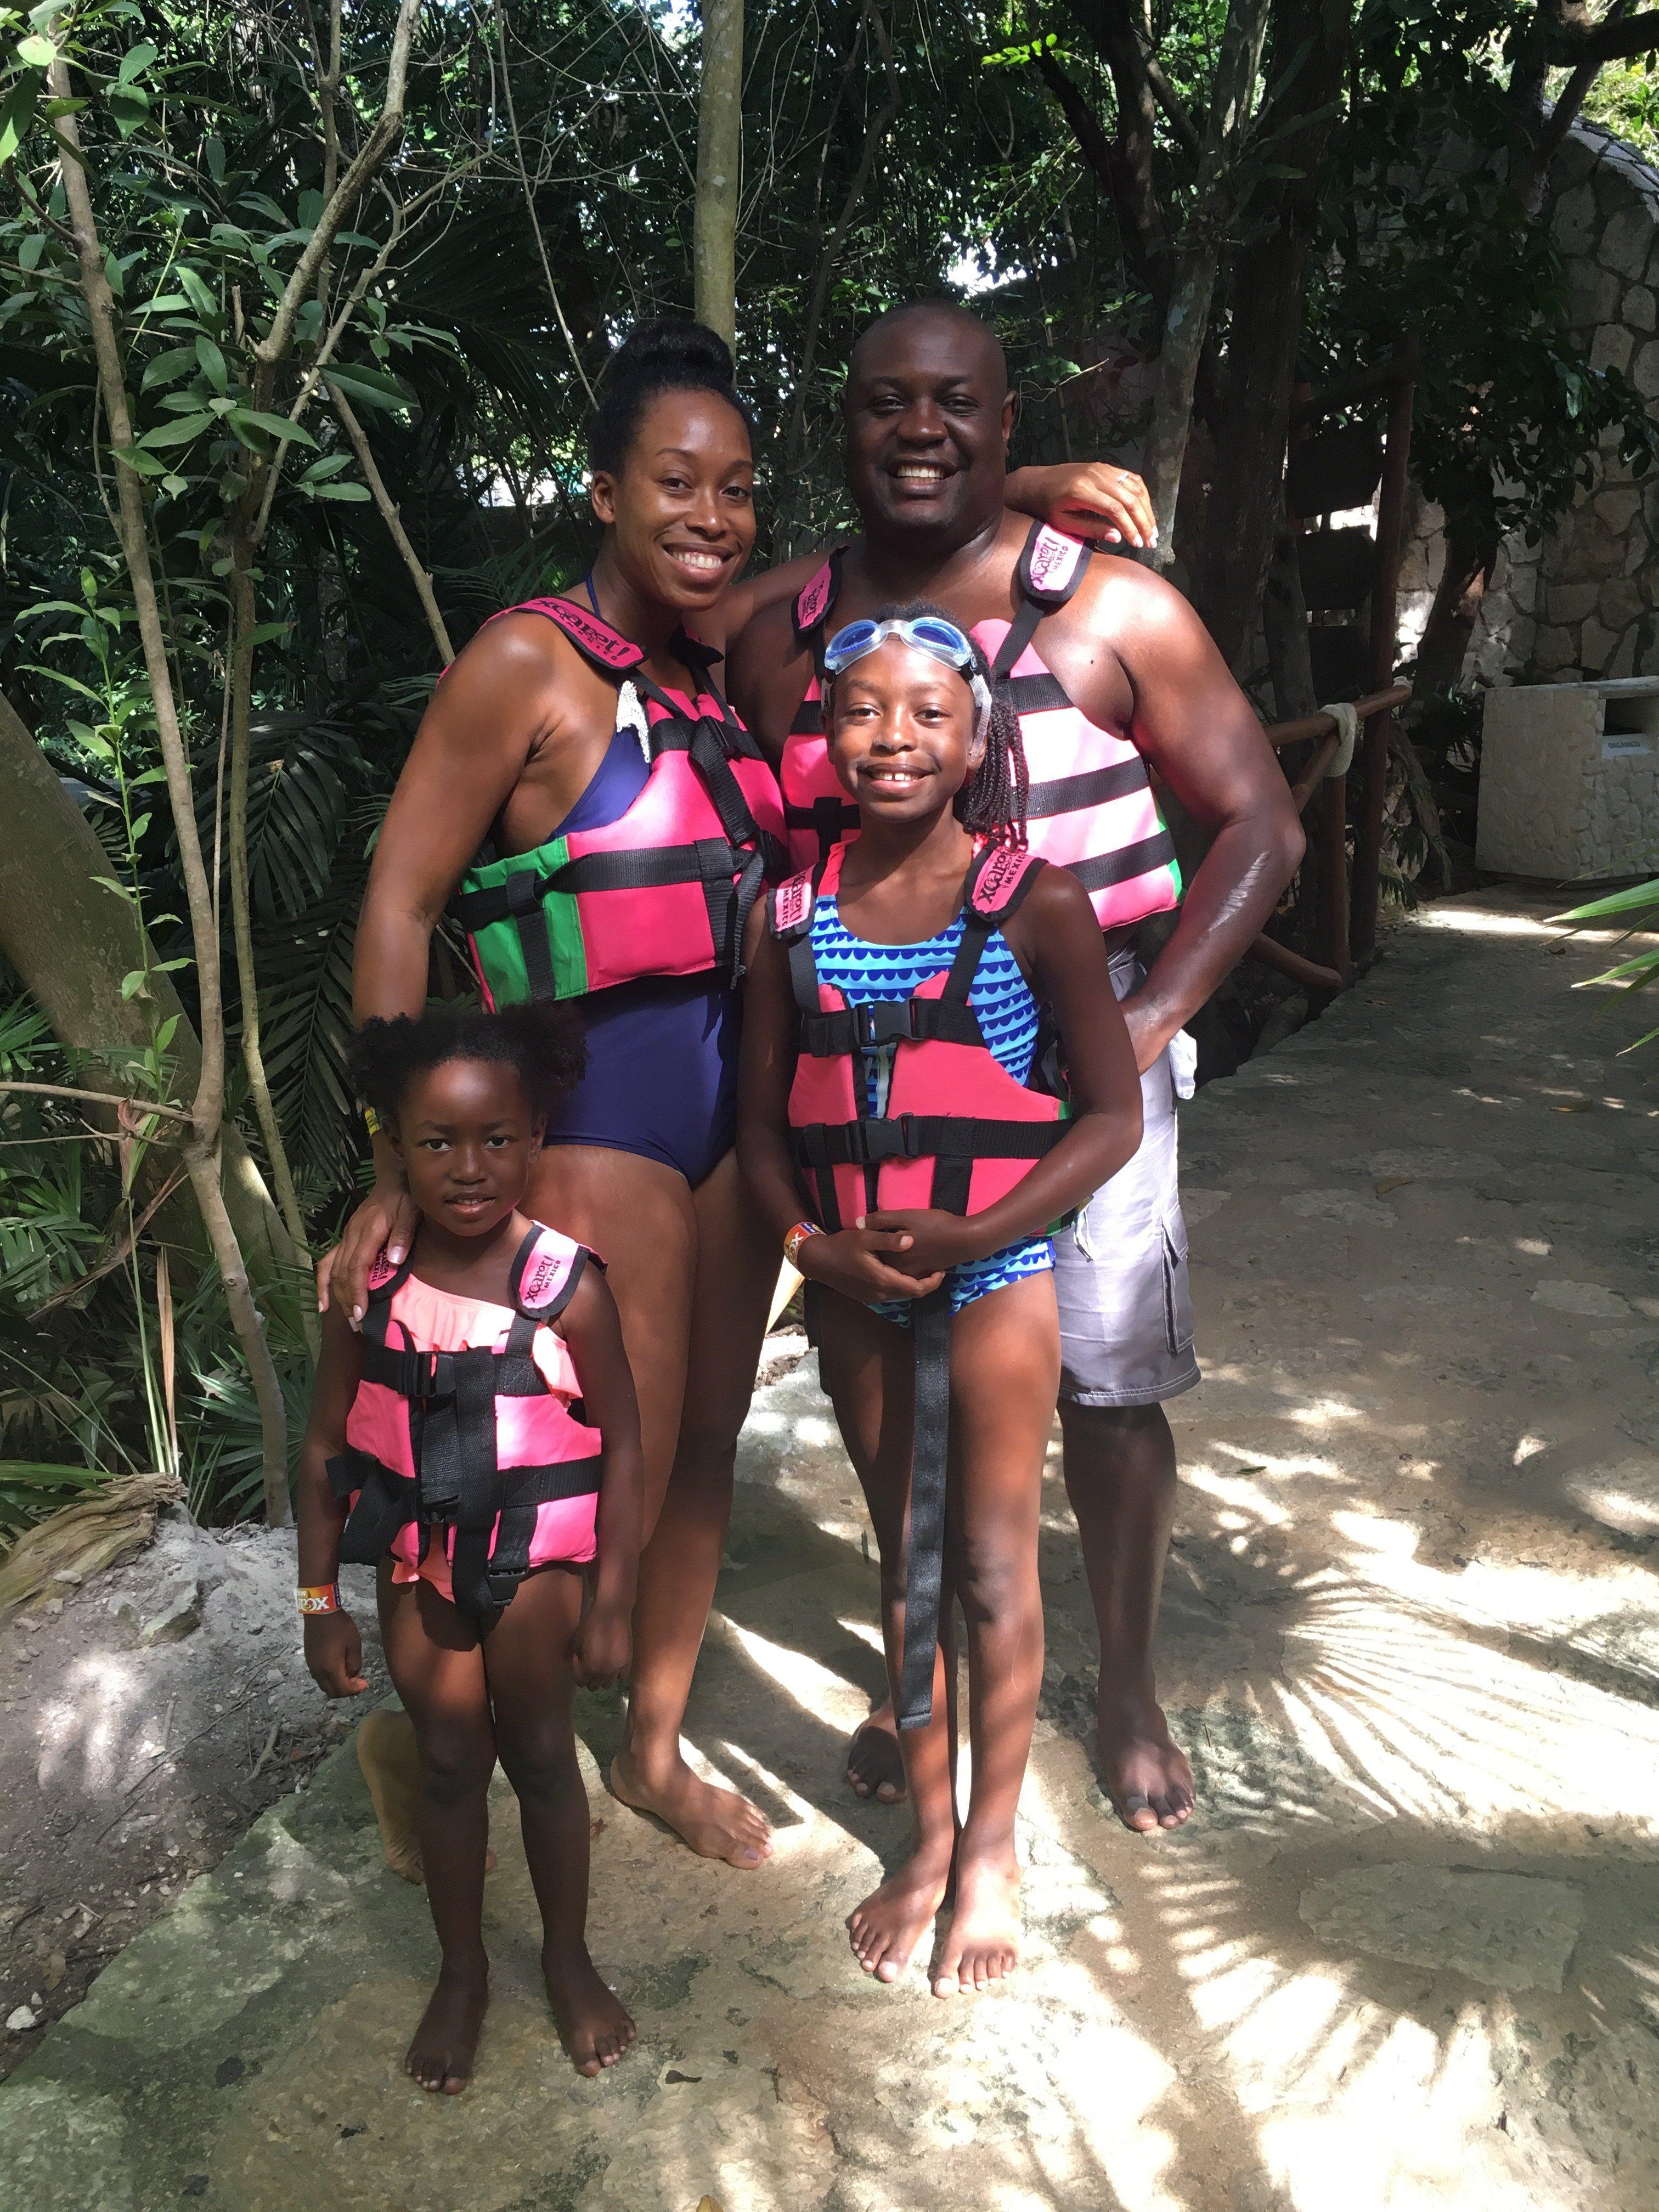 Xcaret cenote river life jackets